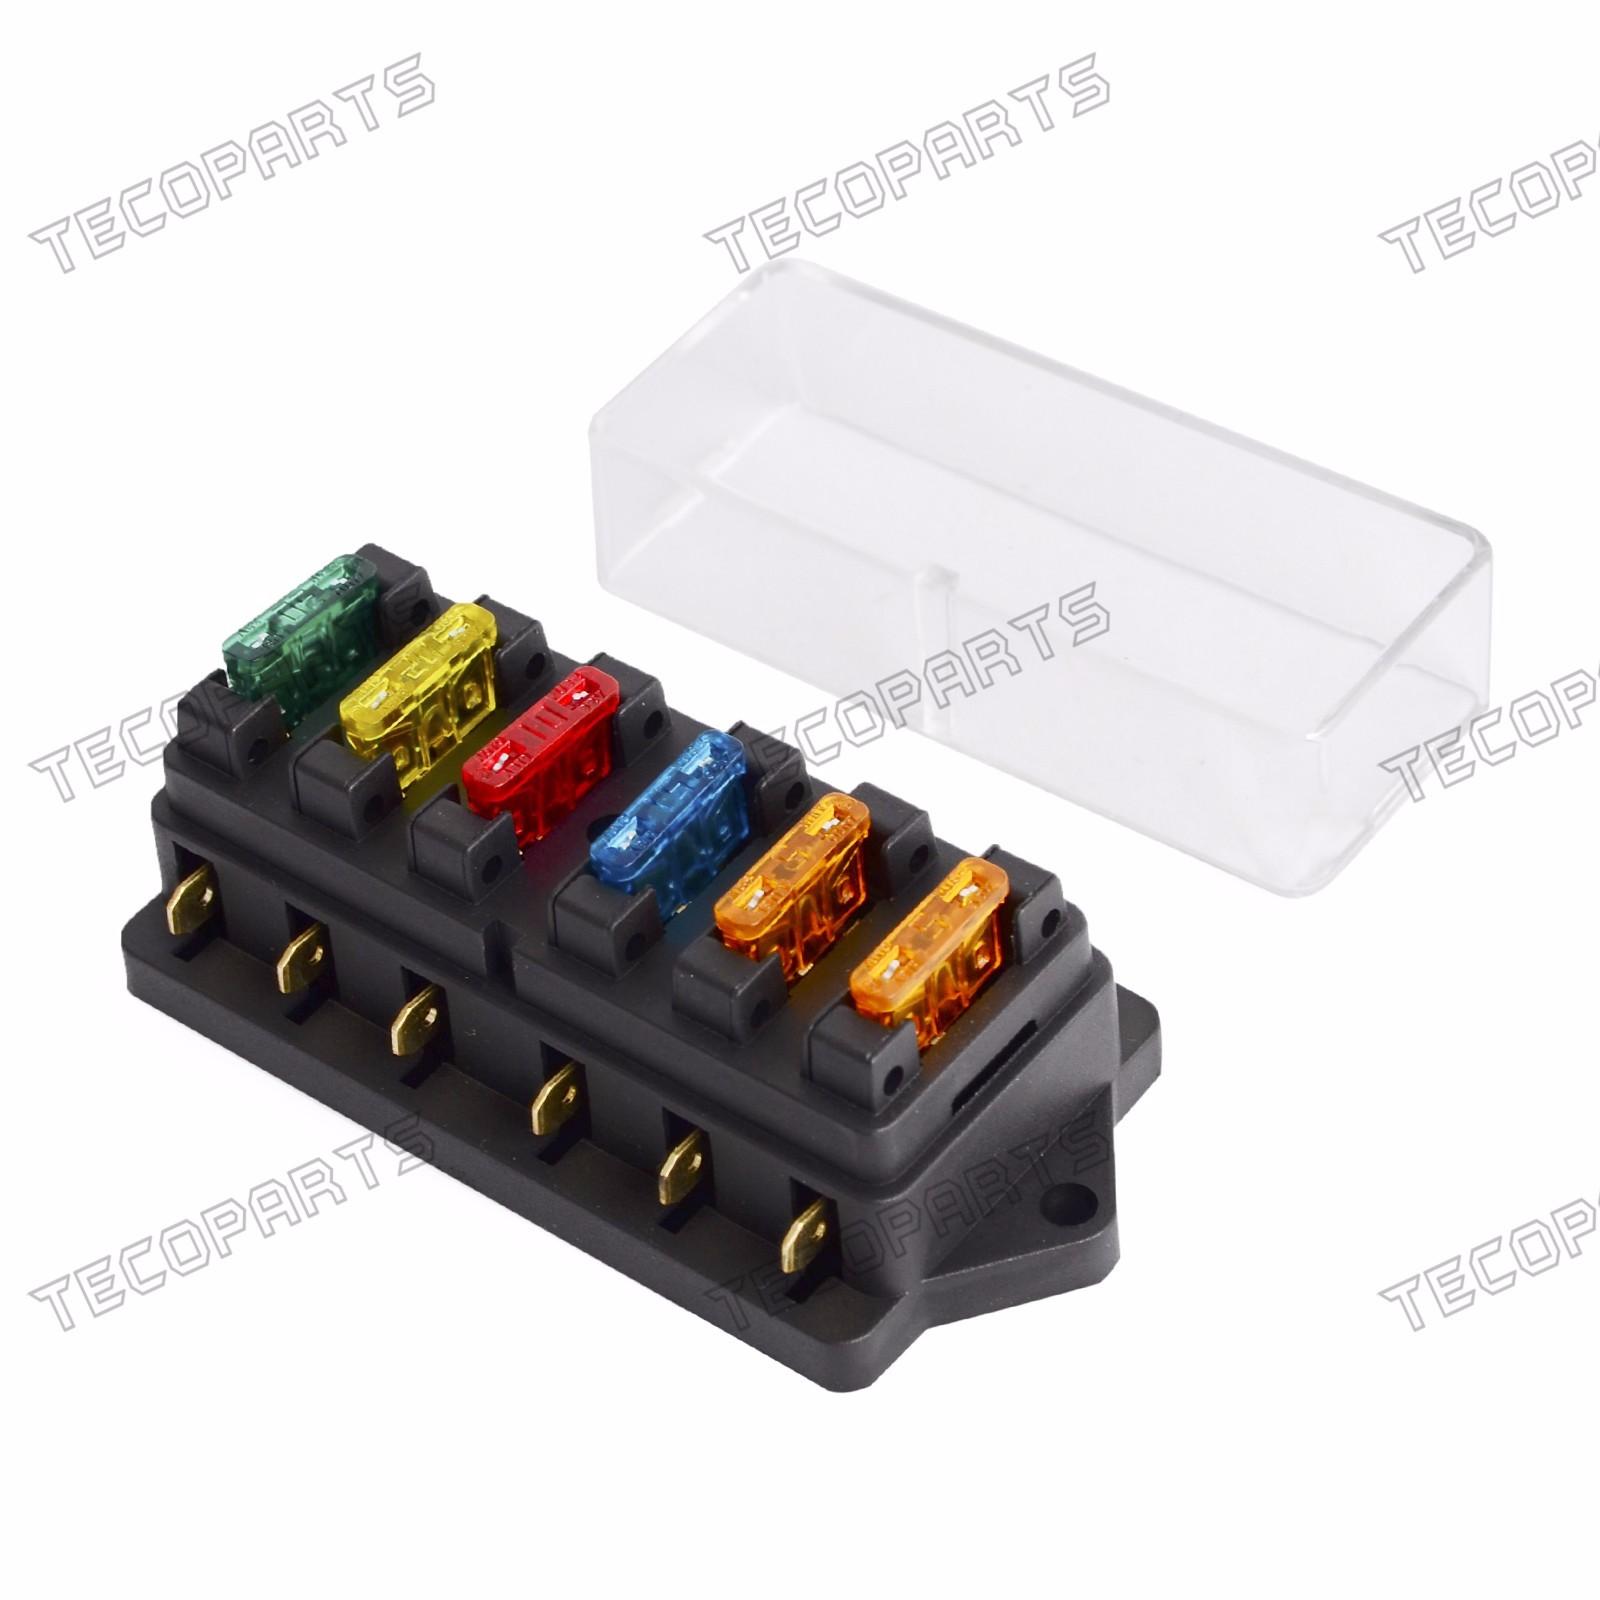 New 6 Way Fuse Holder Box Car Vehicle Circuit Blade Block Power Adapter Free